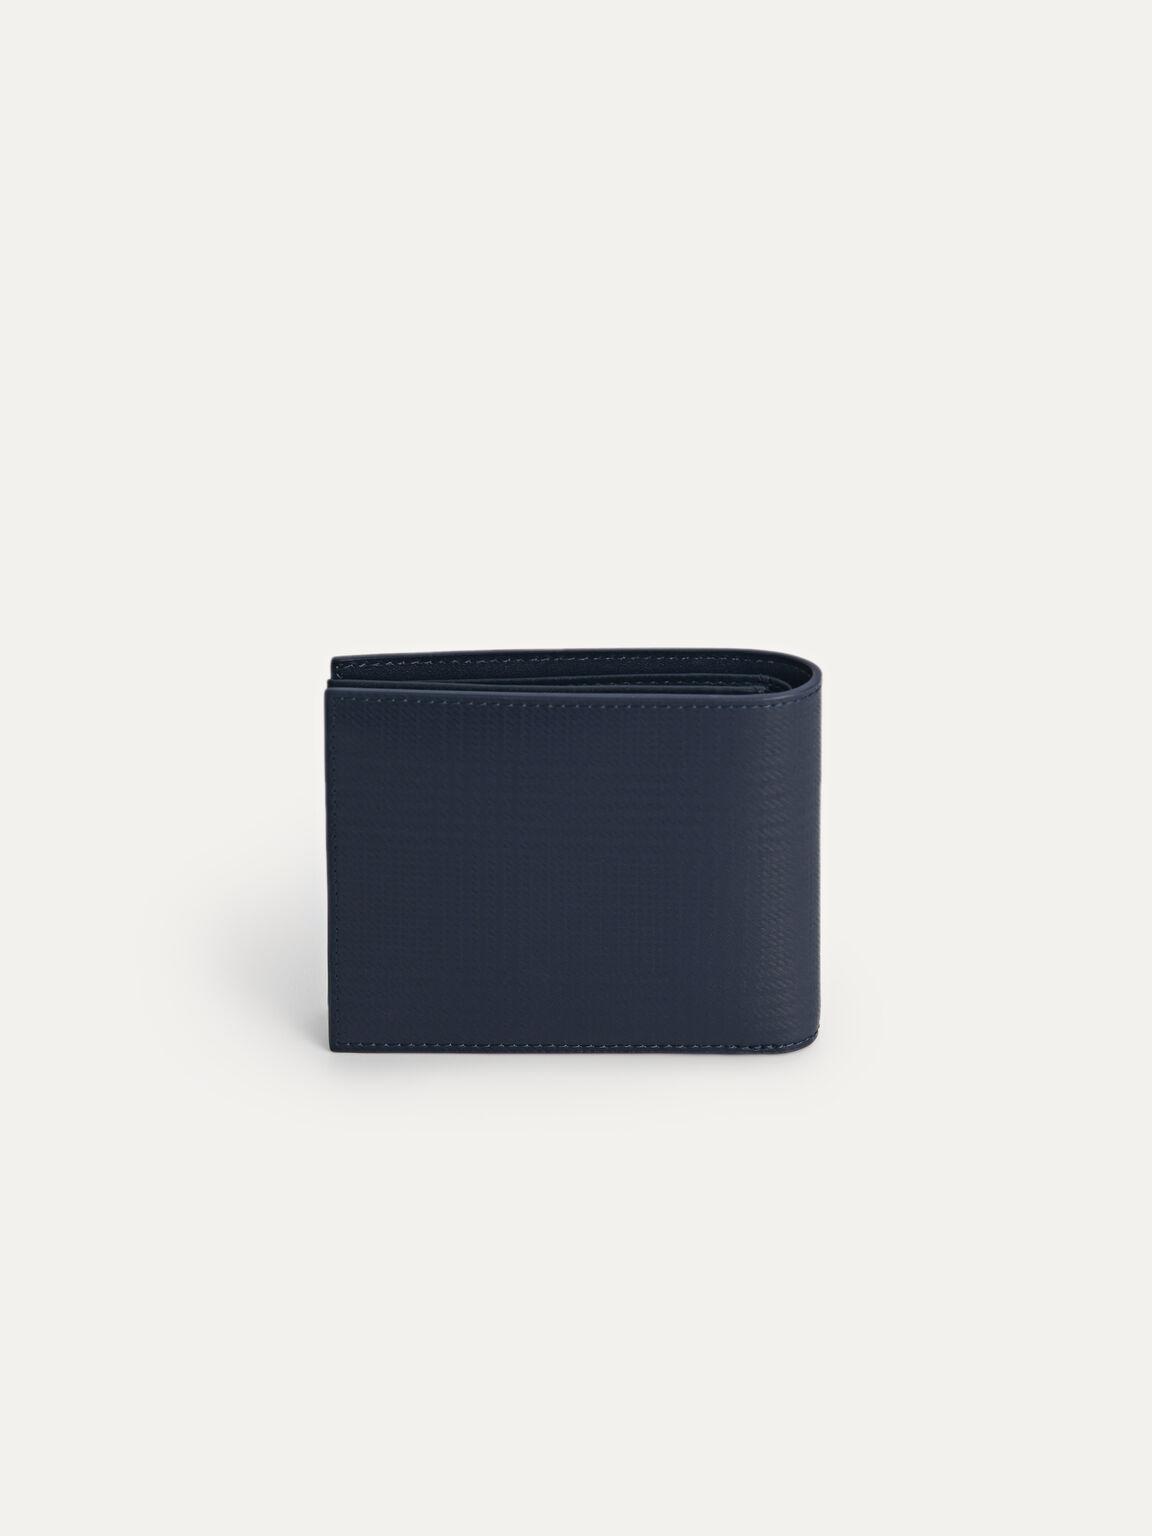 Leather Bi-Fold Wallet with Flip, Navy, hi-res